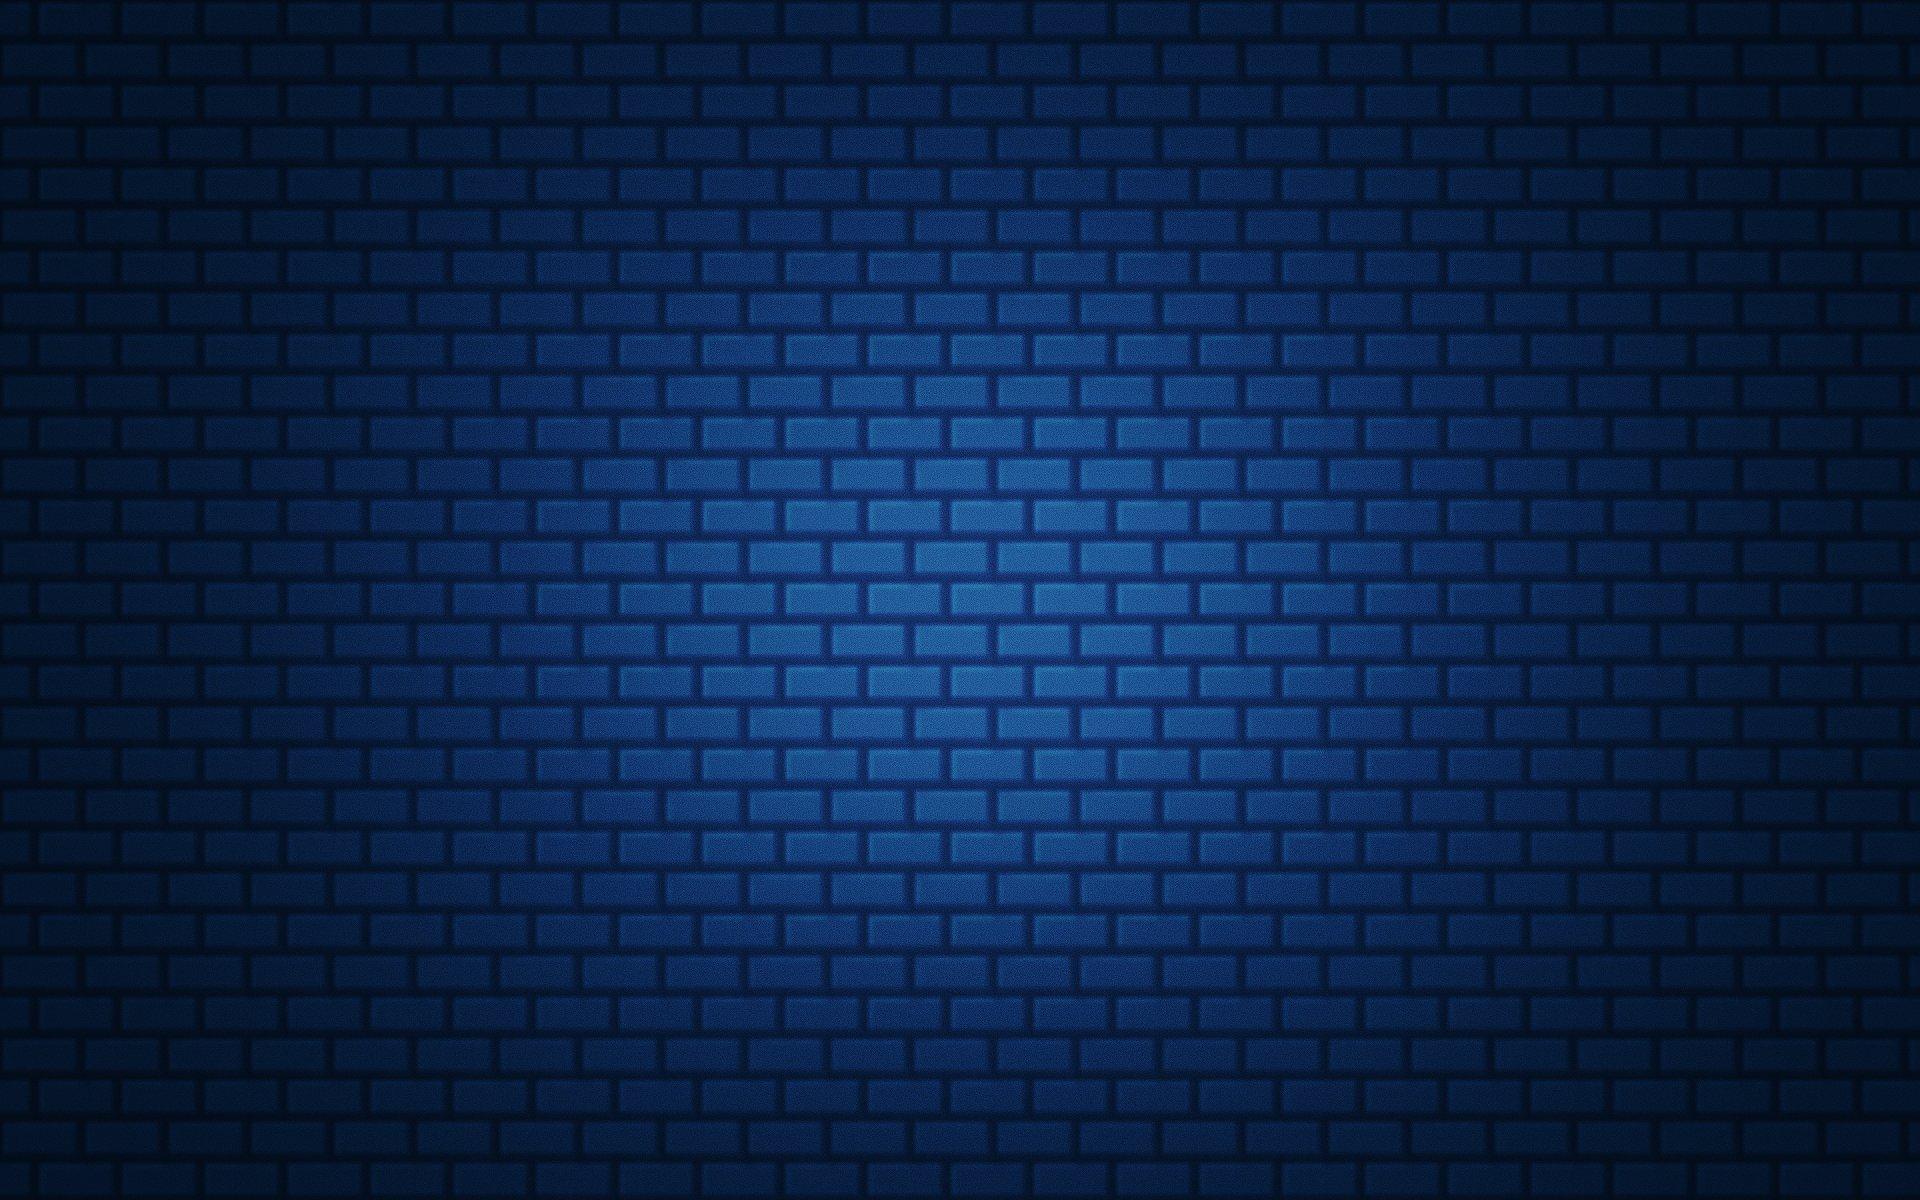 текстура синий кирпич градиент простой HD обои для ноутбука